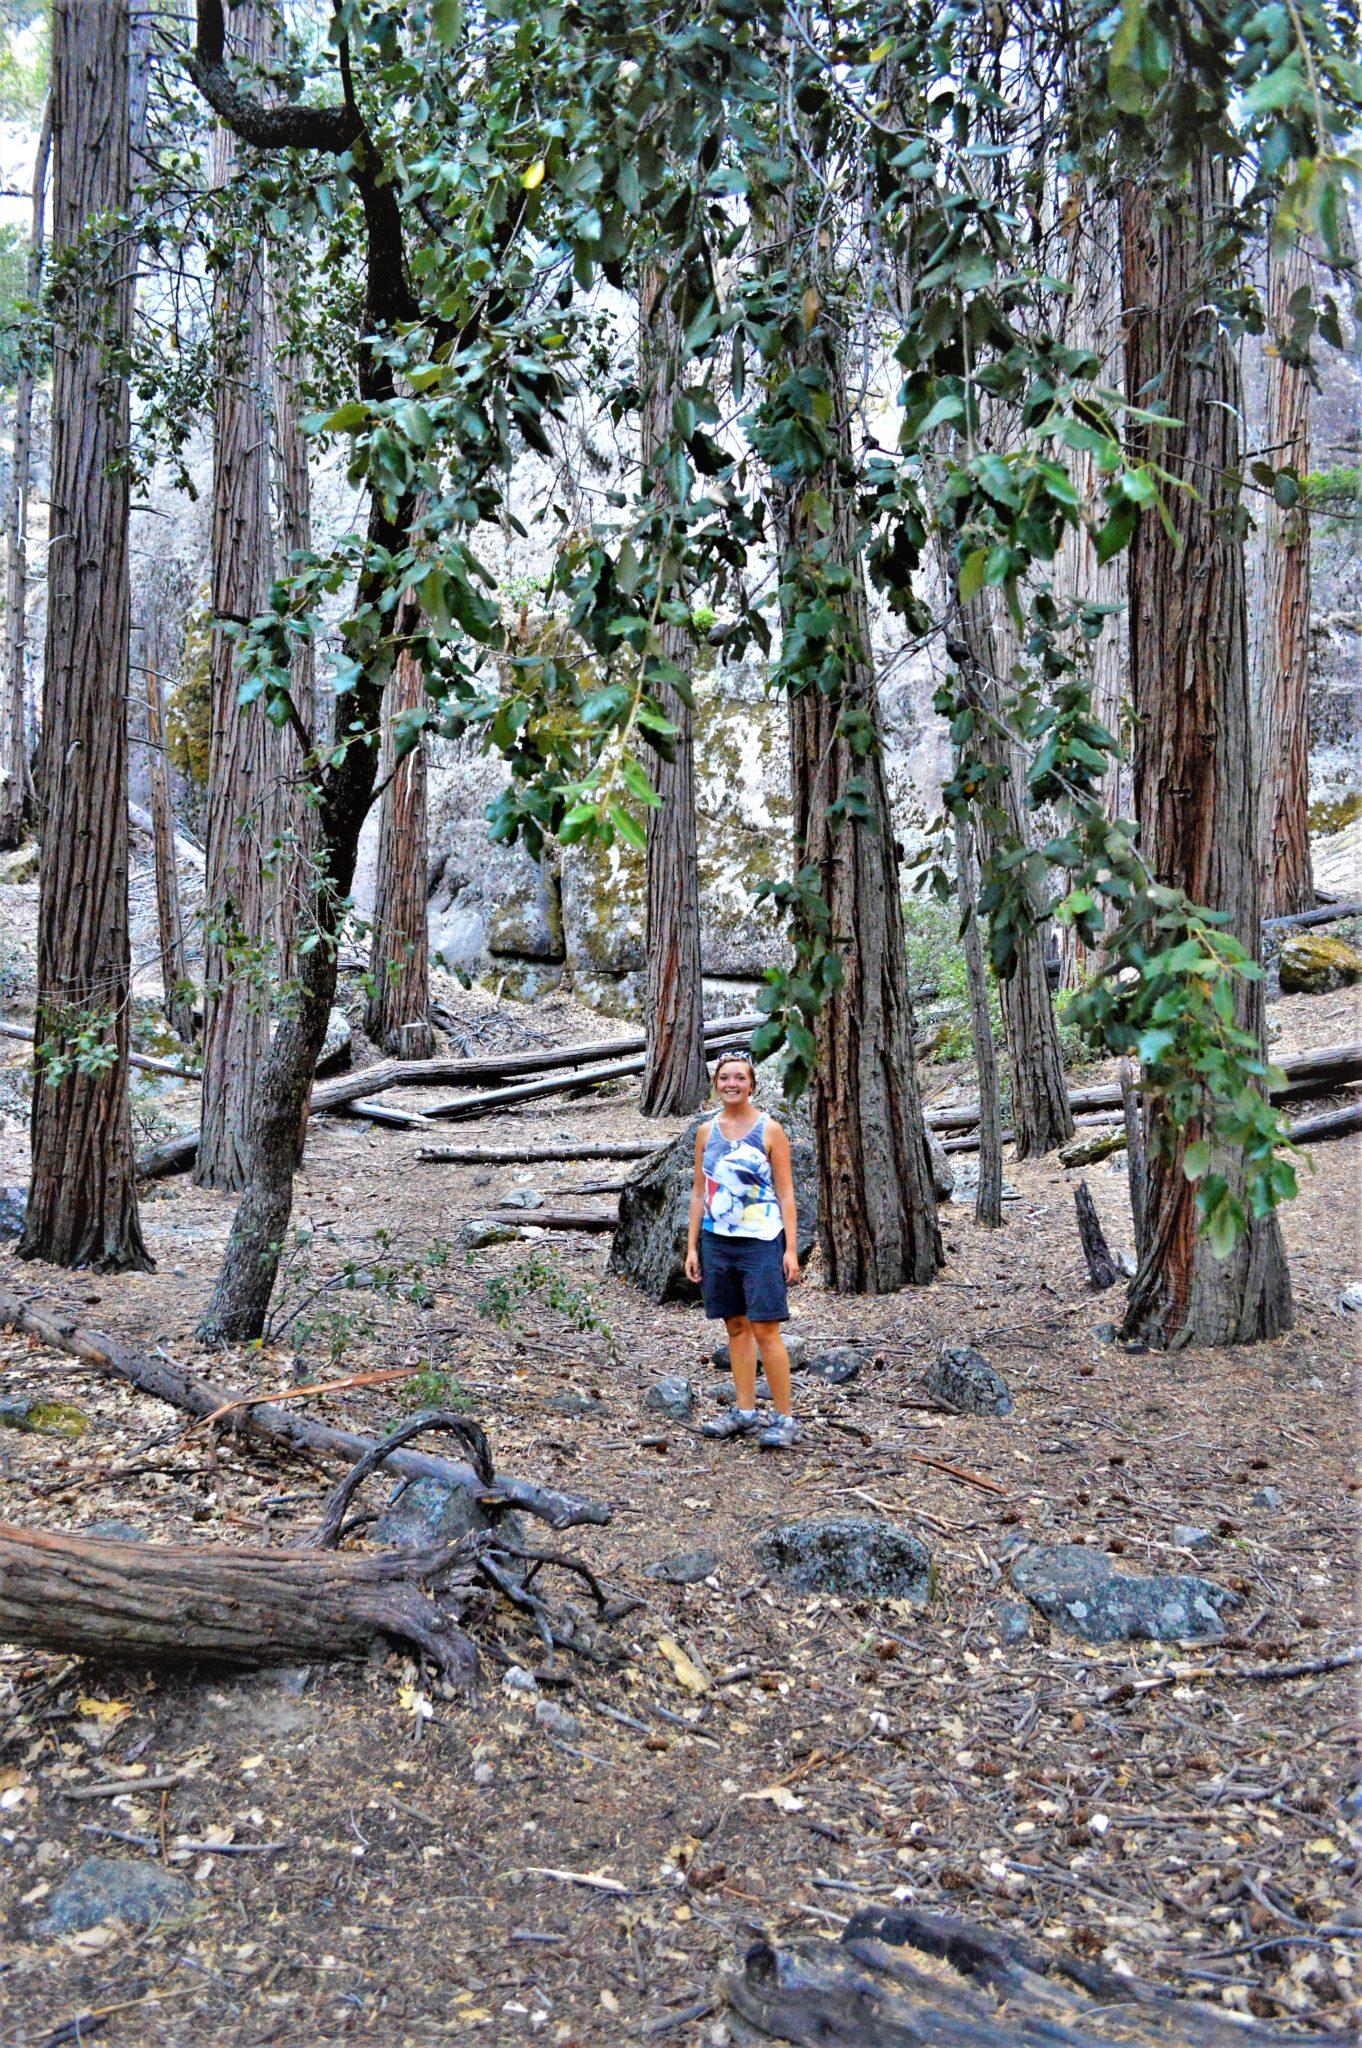 Pine trees, Yosemite Falls, California